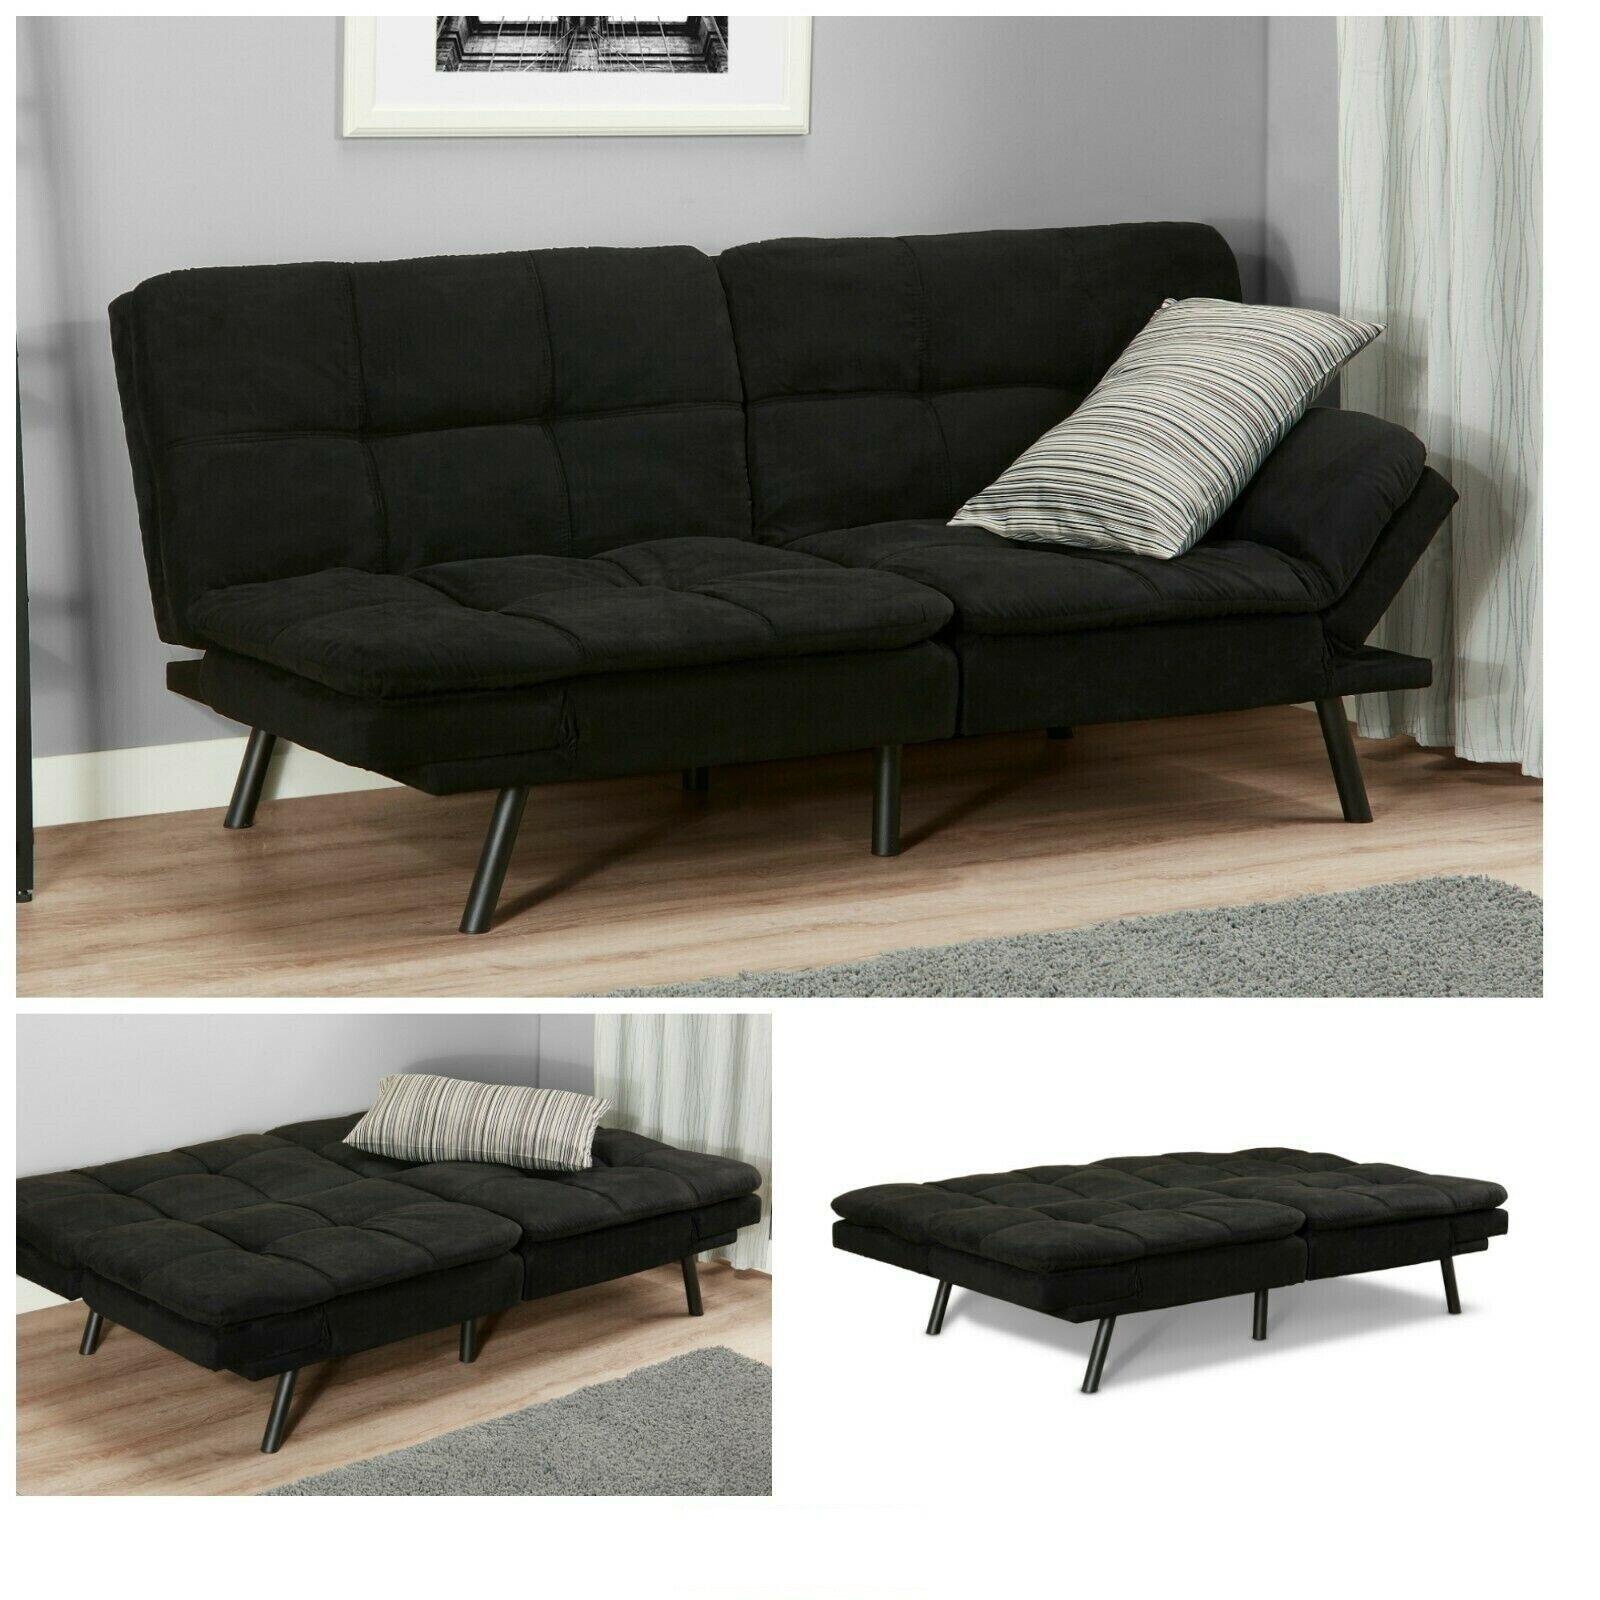 Picture of: Ikea Balkarp Black Sleeper Sofa For Sale Online Ebay